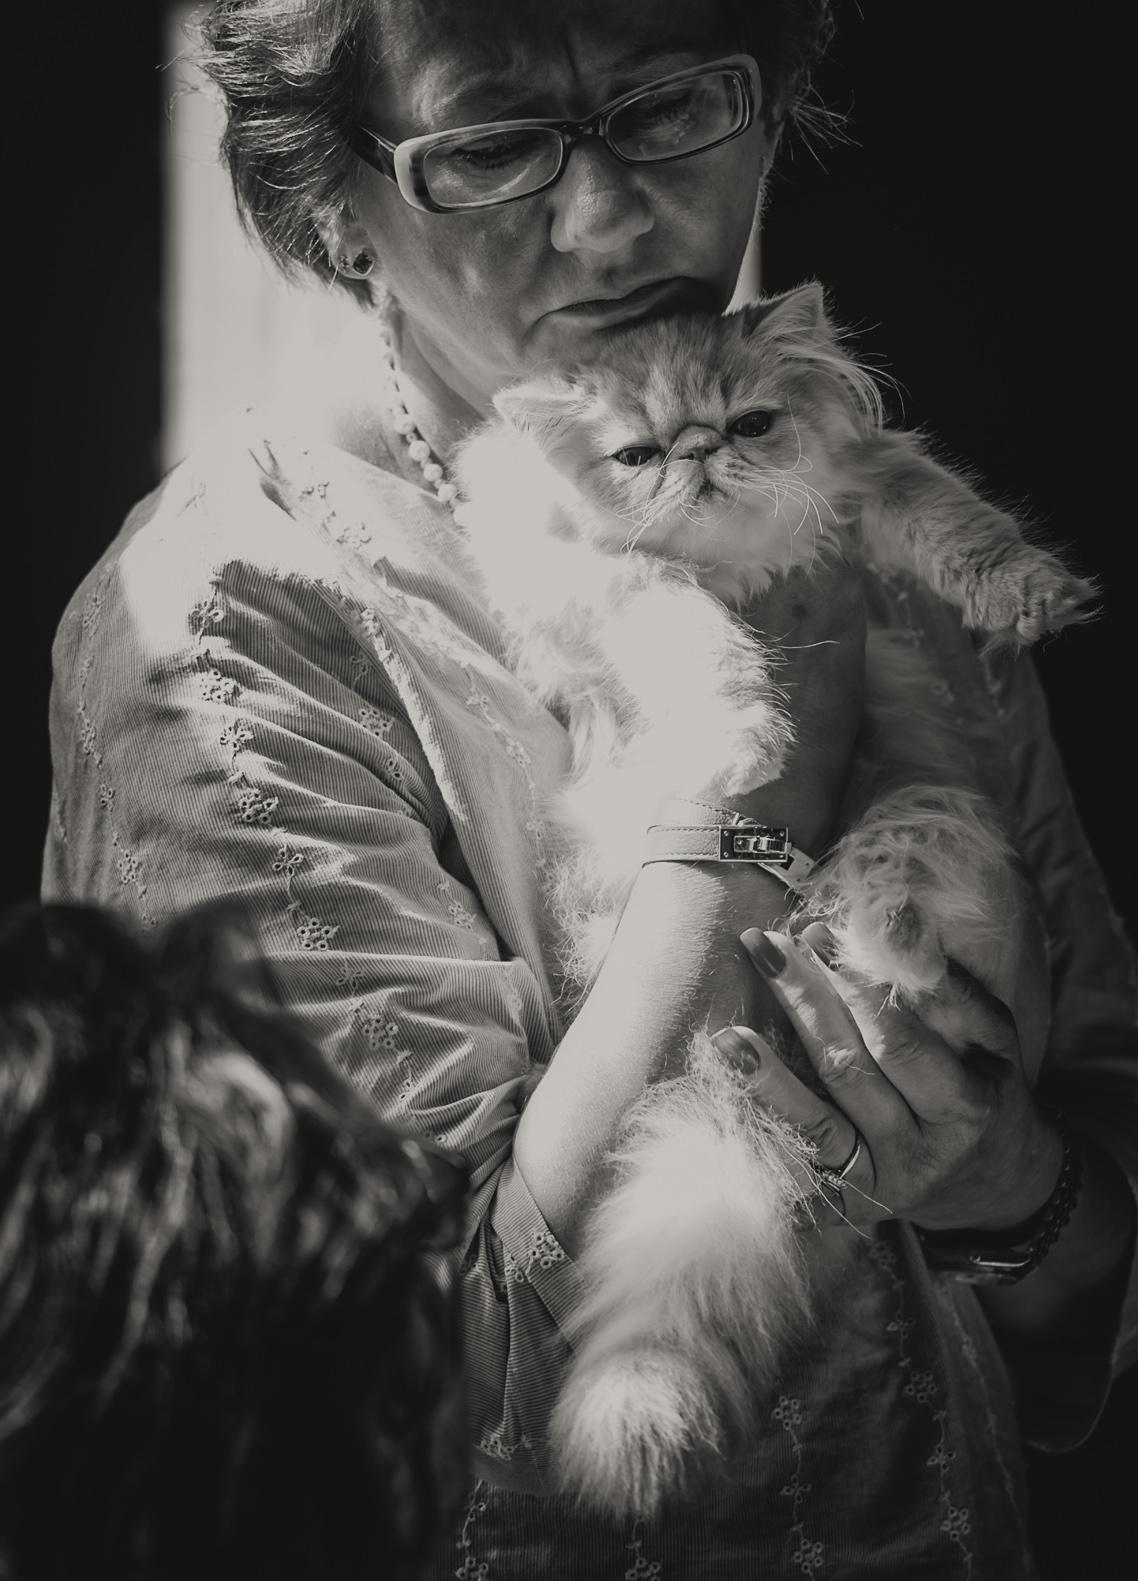 Nostri Vincent Vanilla Dream (Martta) [PER e 24], kuva 210096, 27.7.2013